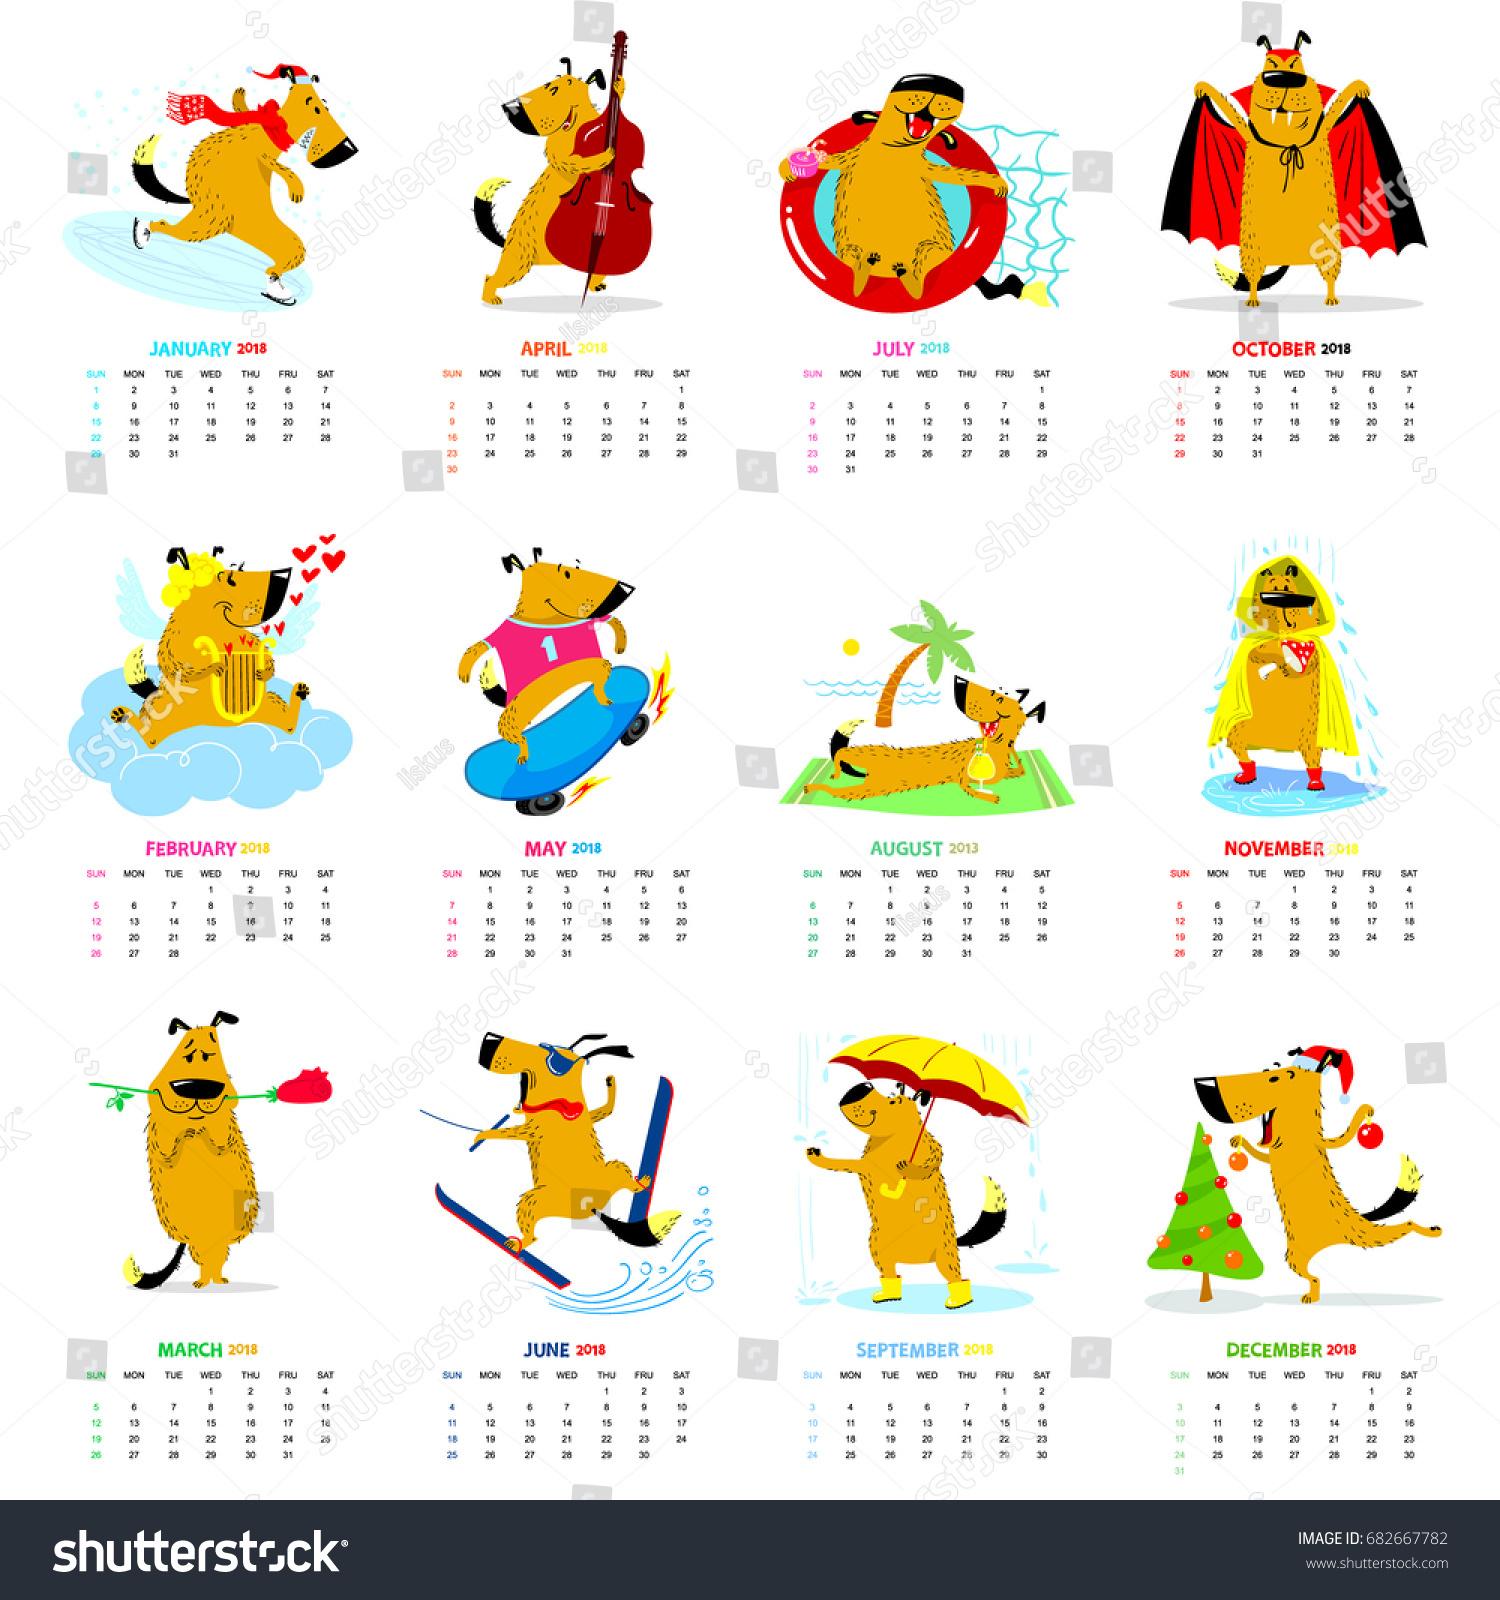 Wallpaper Editorial Calendar : Monthly calendar cute dogs winter stock vector